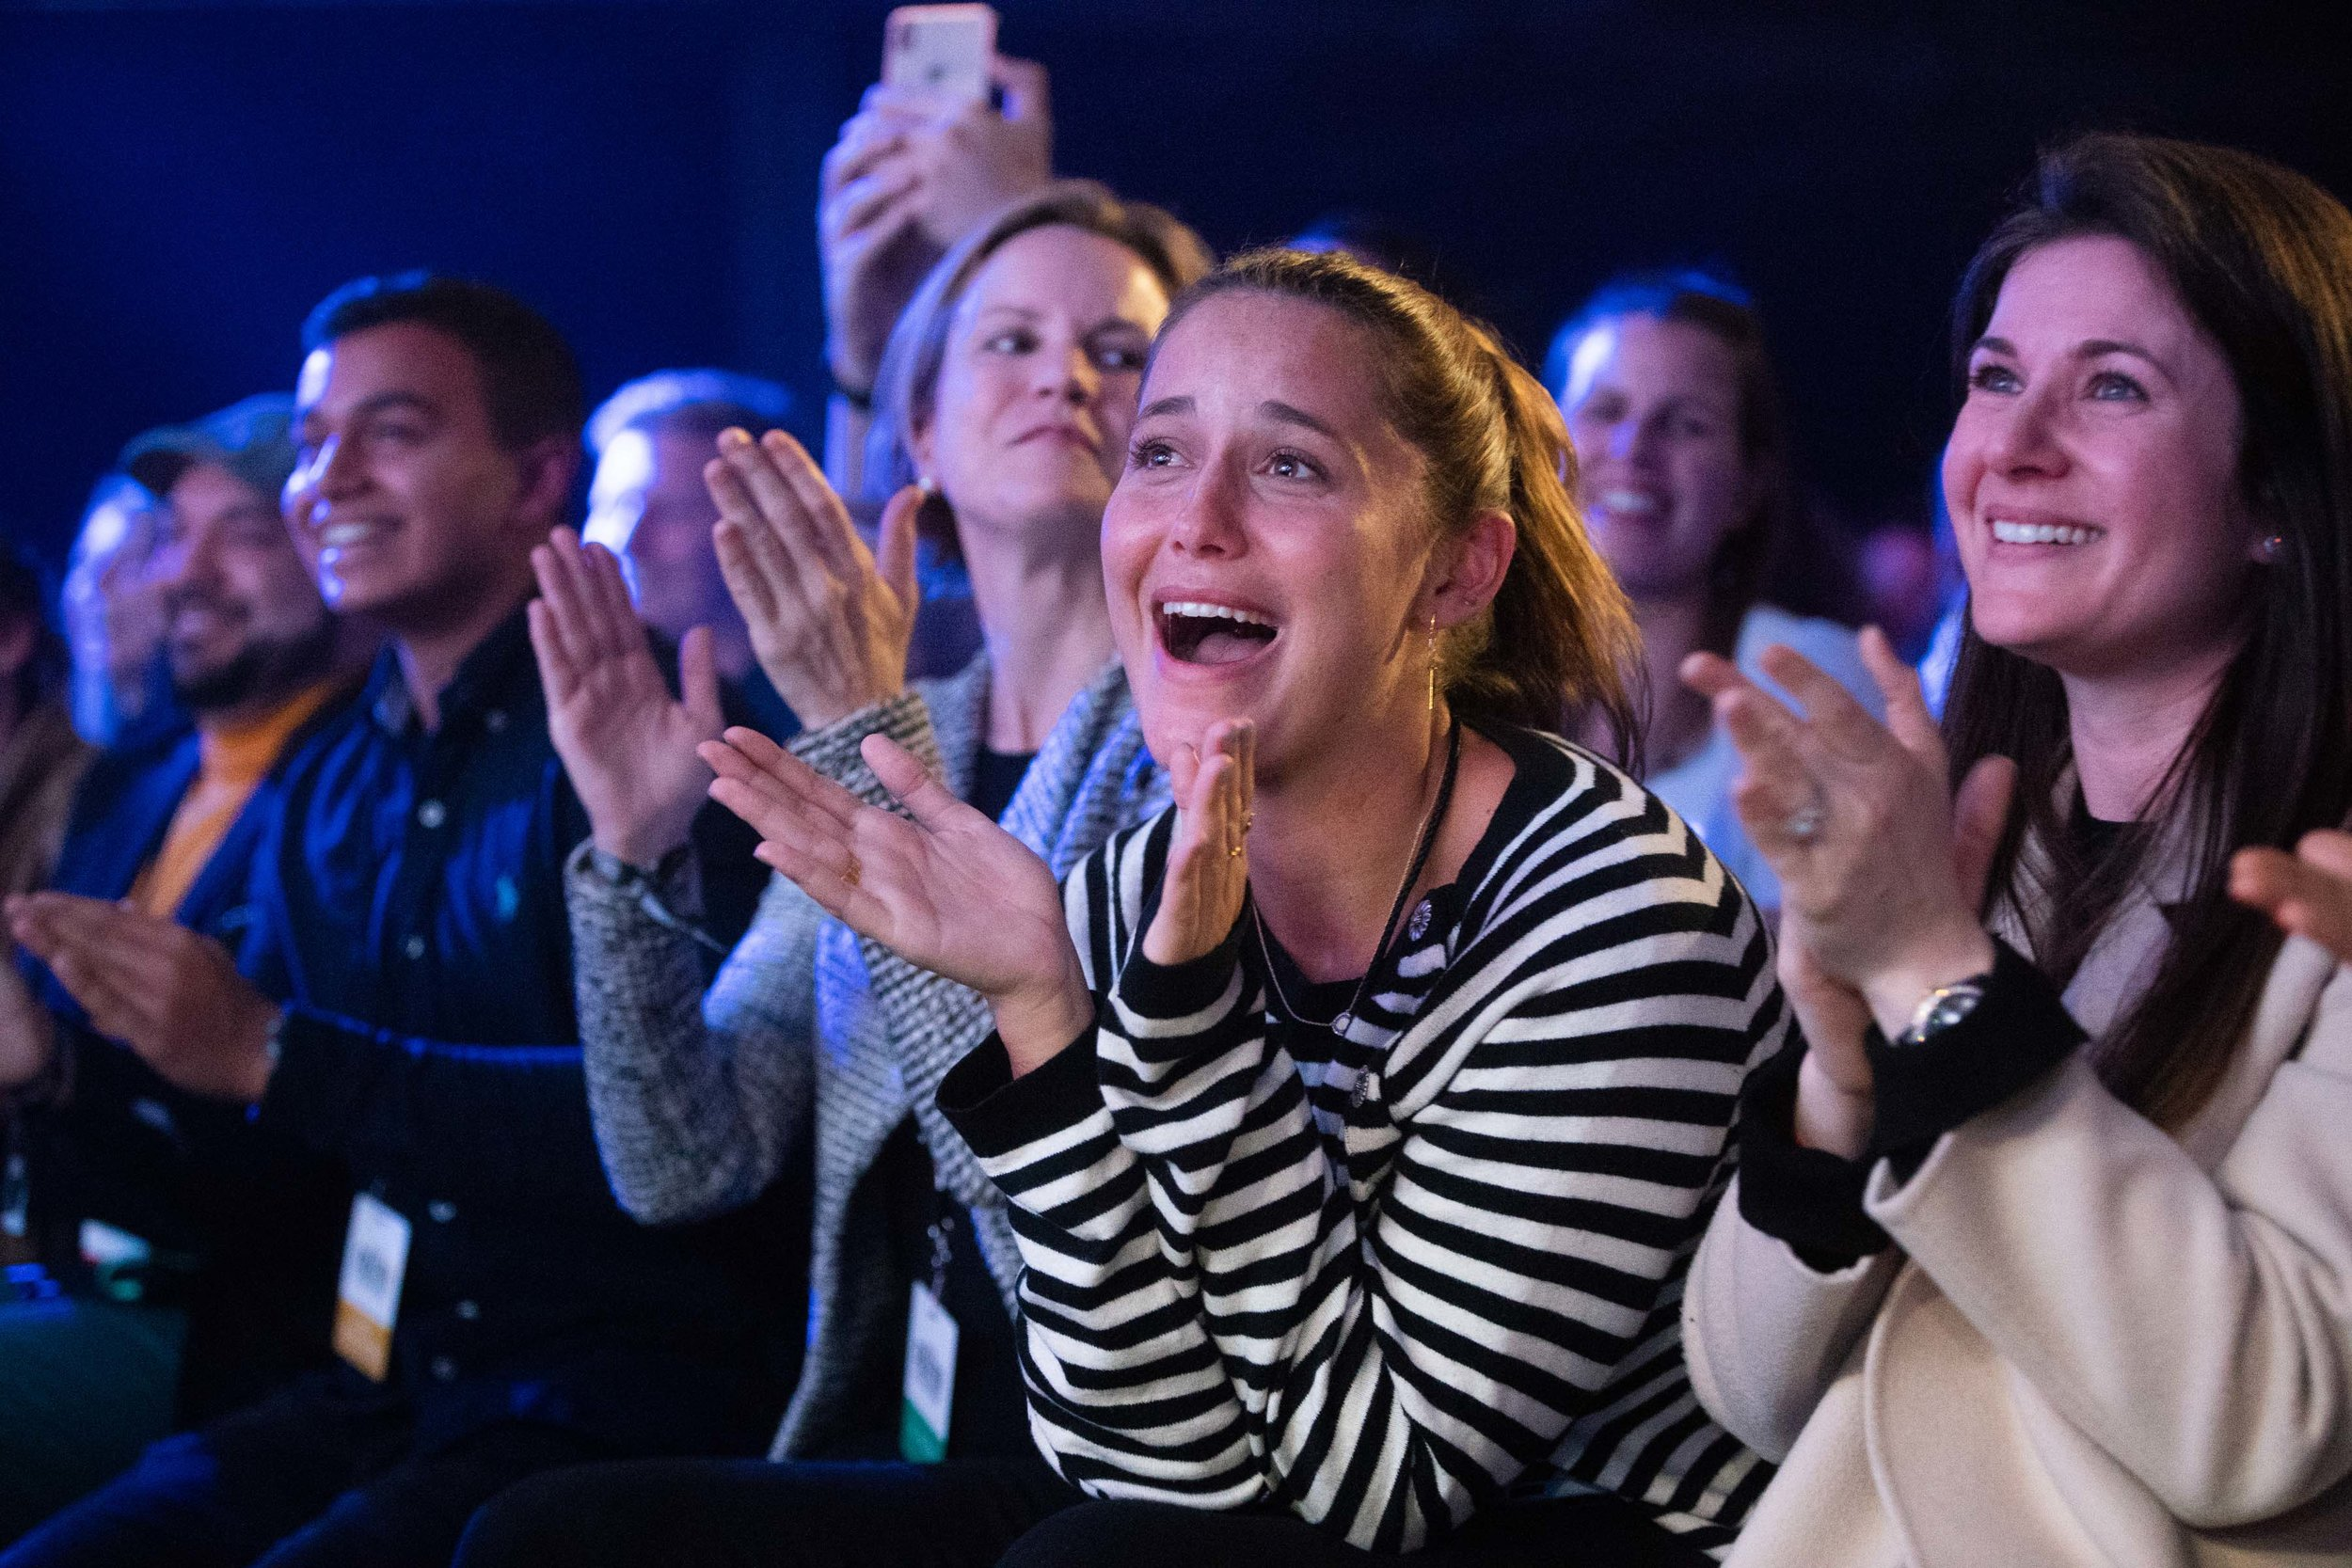 Raccoon_London_We_Work_Creators_Awards_2018_Event_Photography-13.jpg